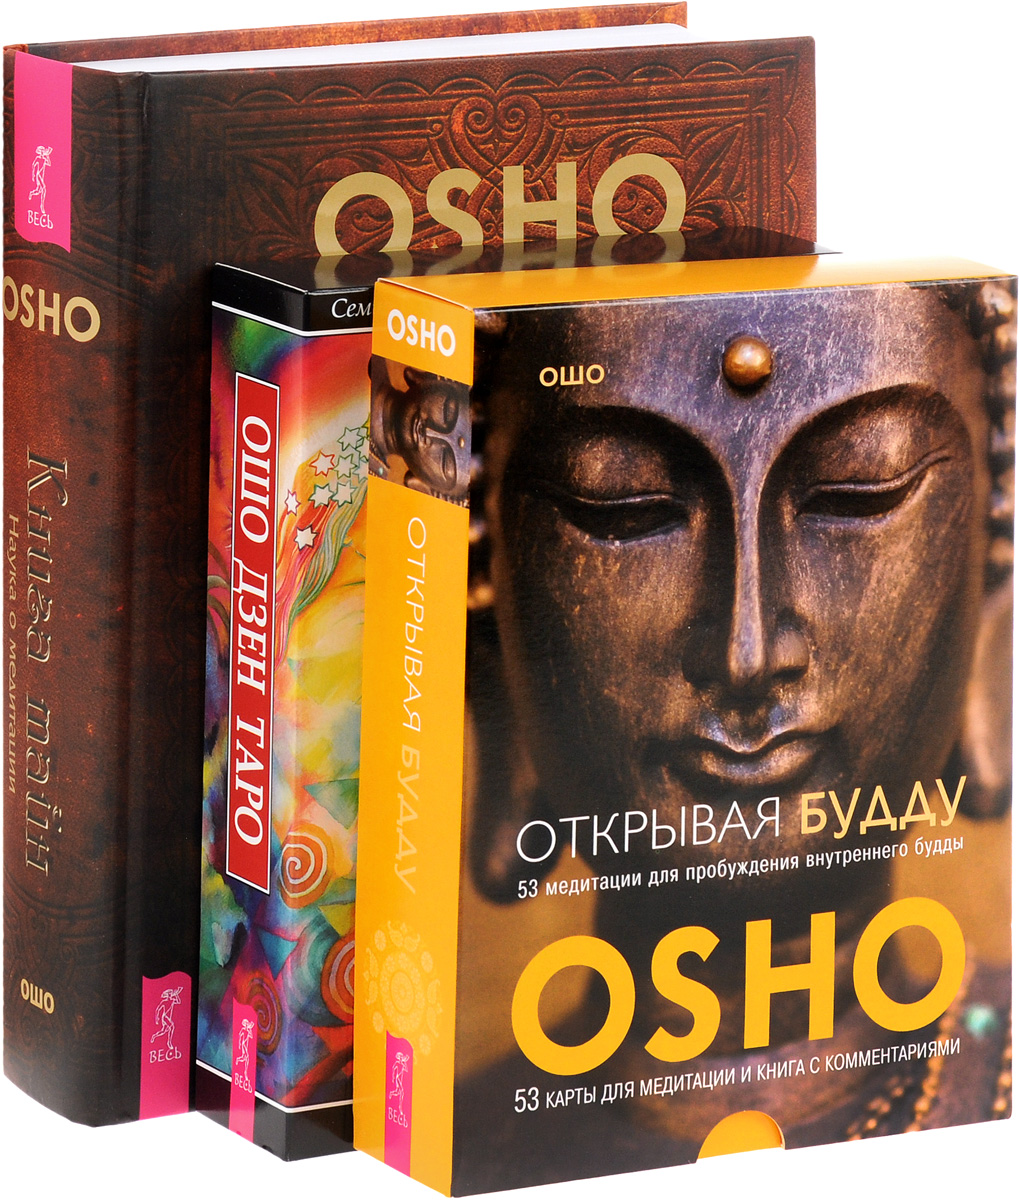 Ошо Открывая Будду. Ошо Дзен Таро. Книга тайн (комплект из 3 книг) ошо о понимании